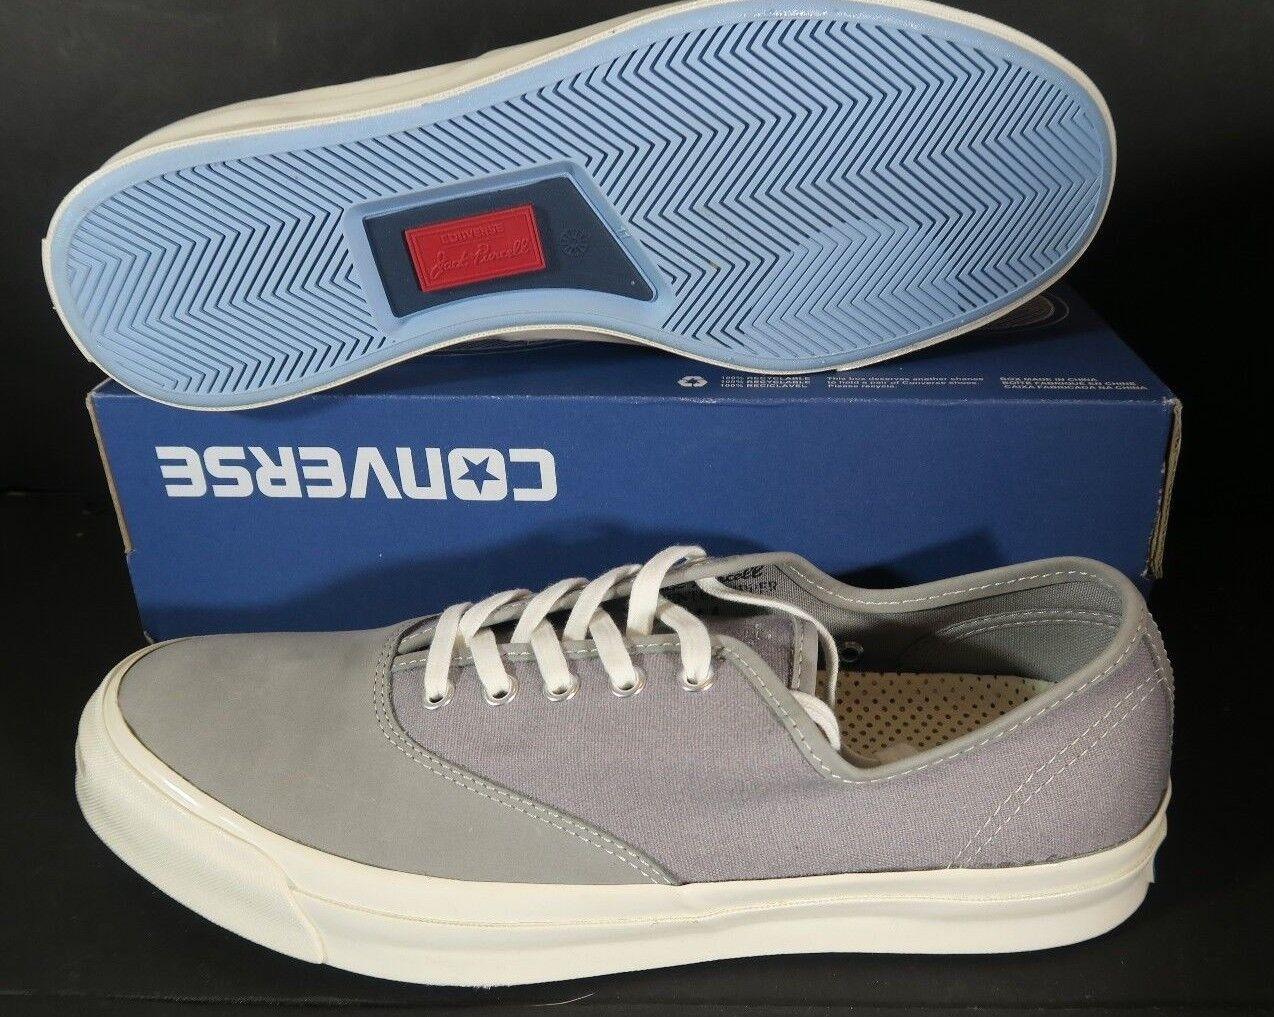 Converse JP Signature CVO Ox Grey/White 153593 Size 11 Nubuck Wool NO BOX LID*